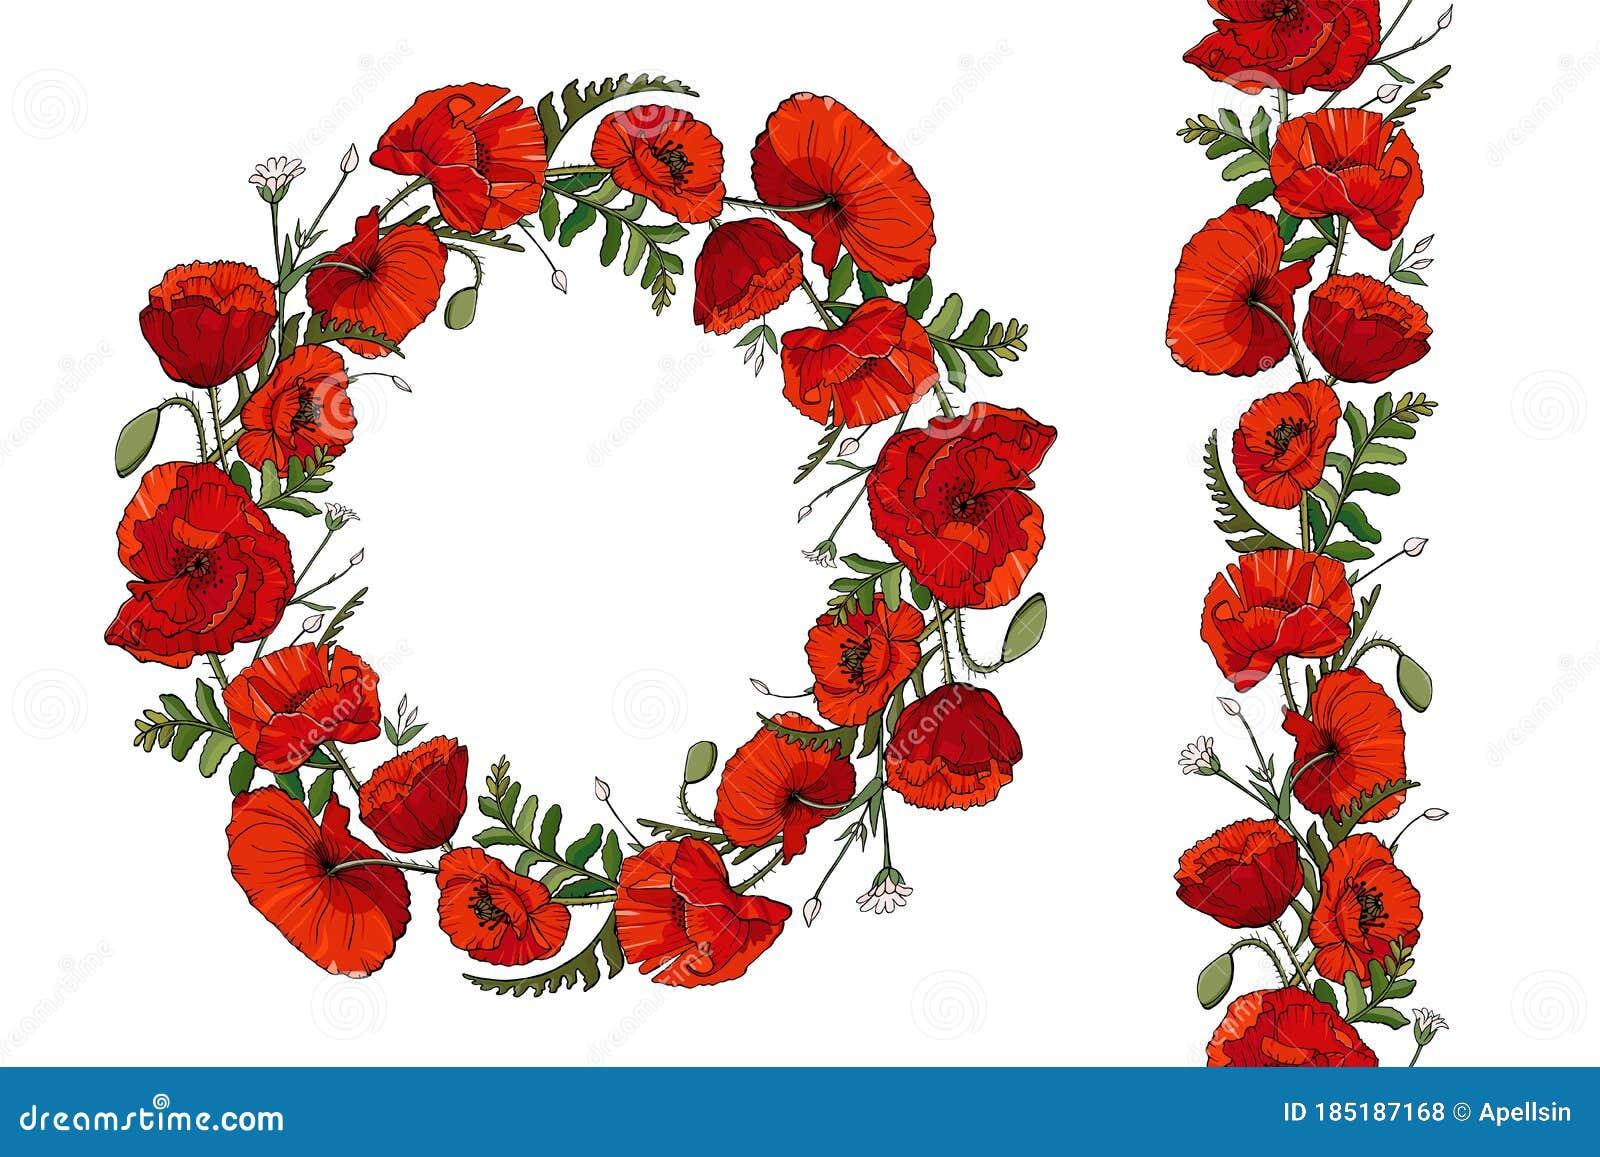 Poppy Flower Wreath And Seamless Brush Stock Vector Illustration Of Botanic Horizontal 185187168